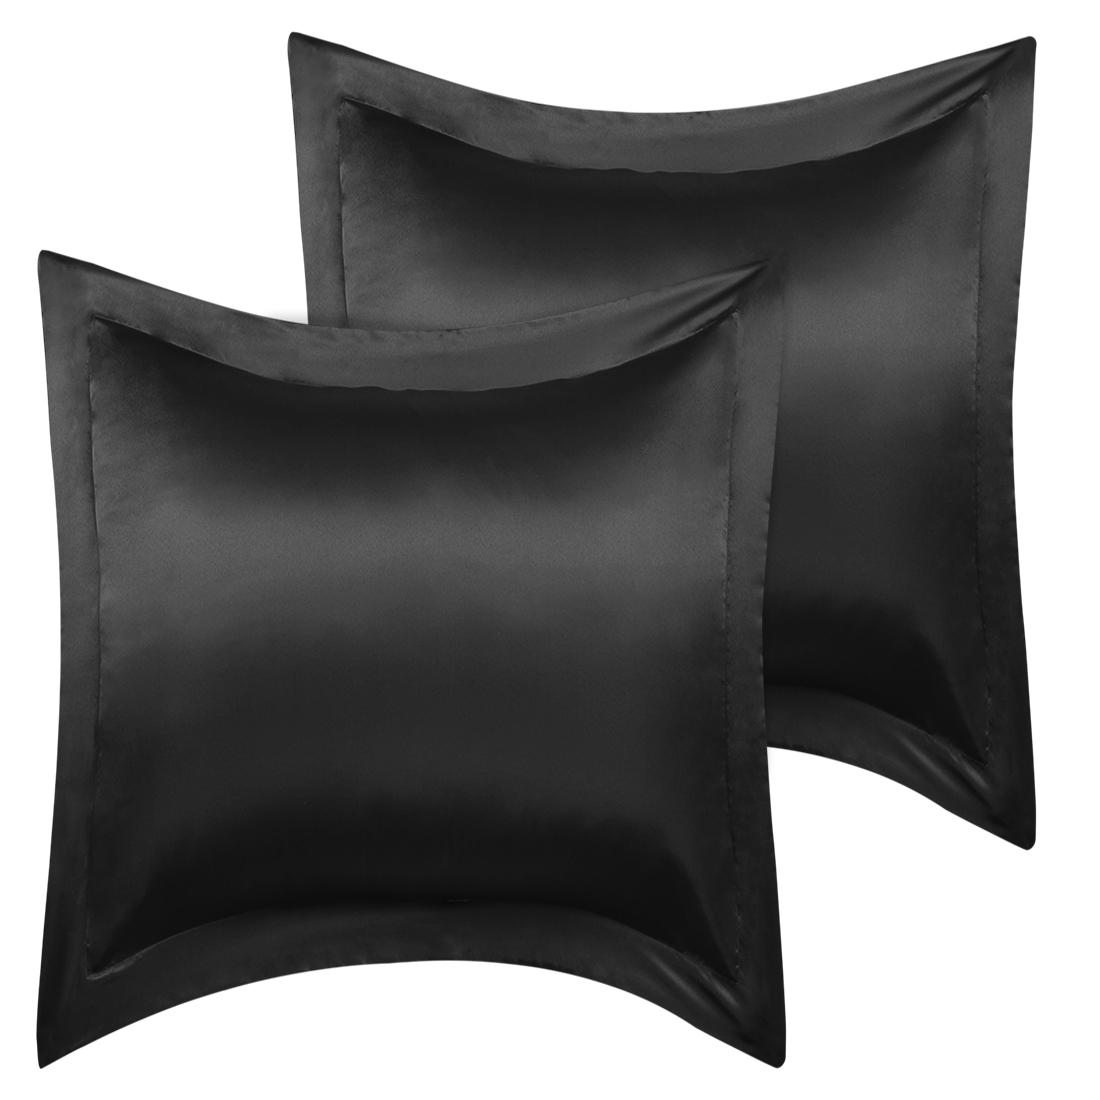 2 Pcs Black Pillow Shams Satin Pillow Cases European Oxford Pillowcases